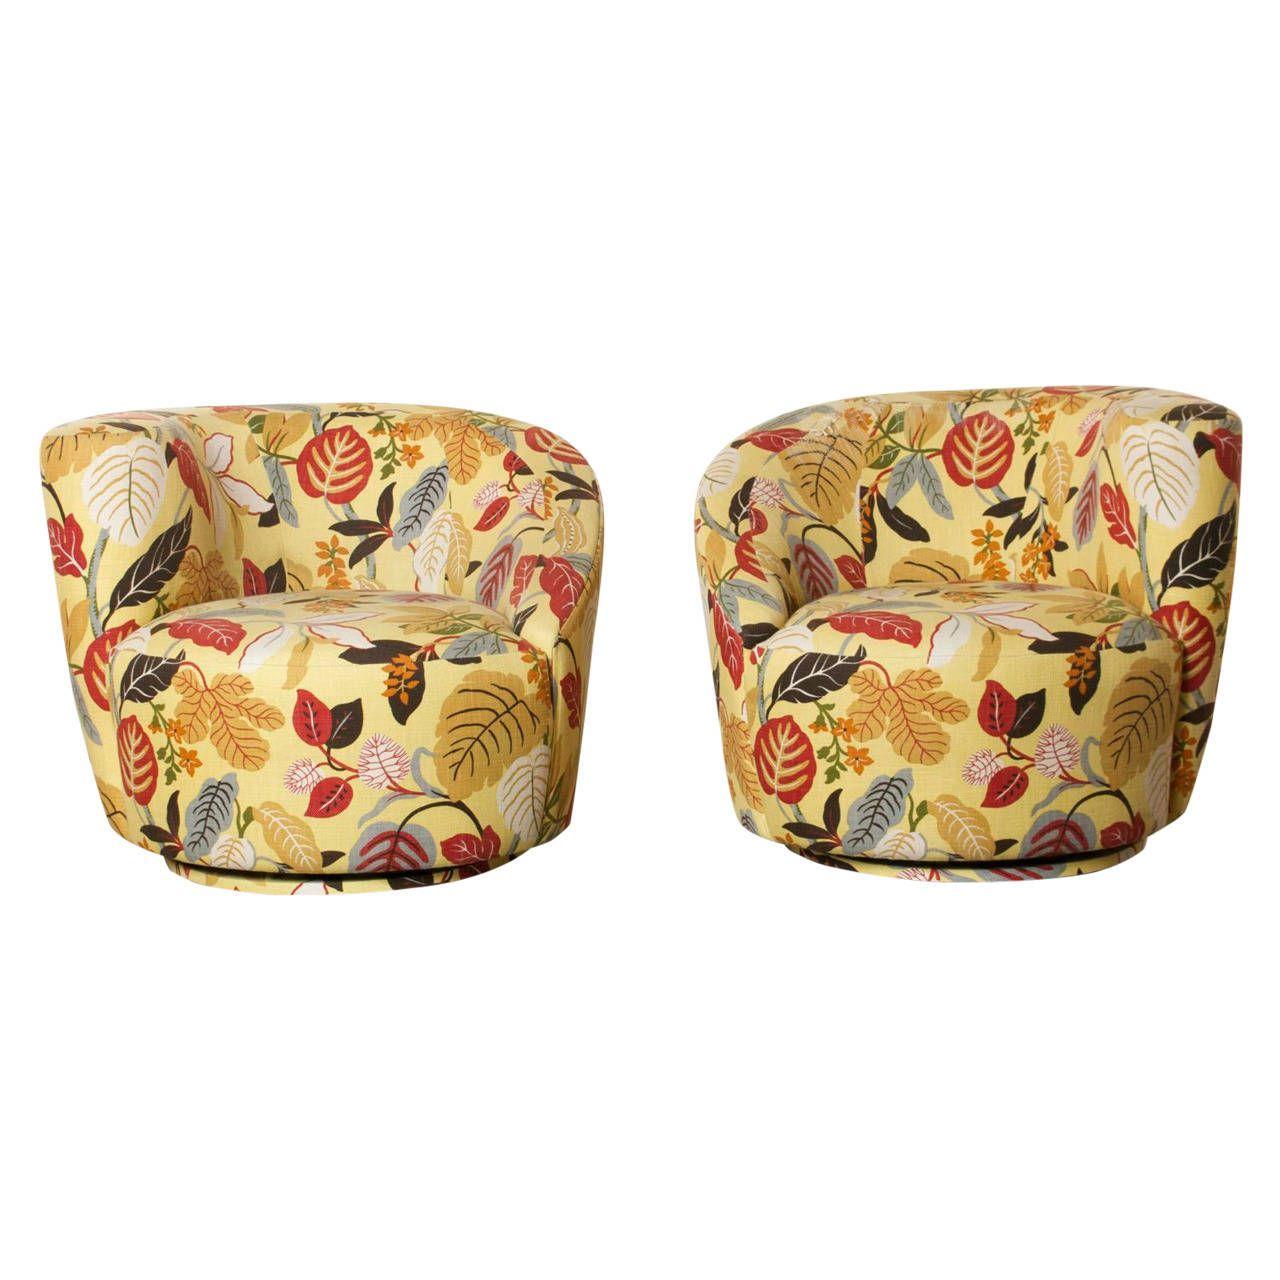 Nautilus Chairs By Vladimir Kagan